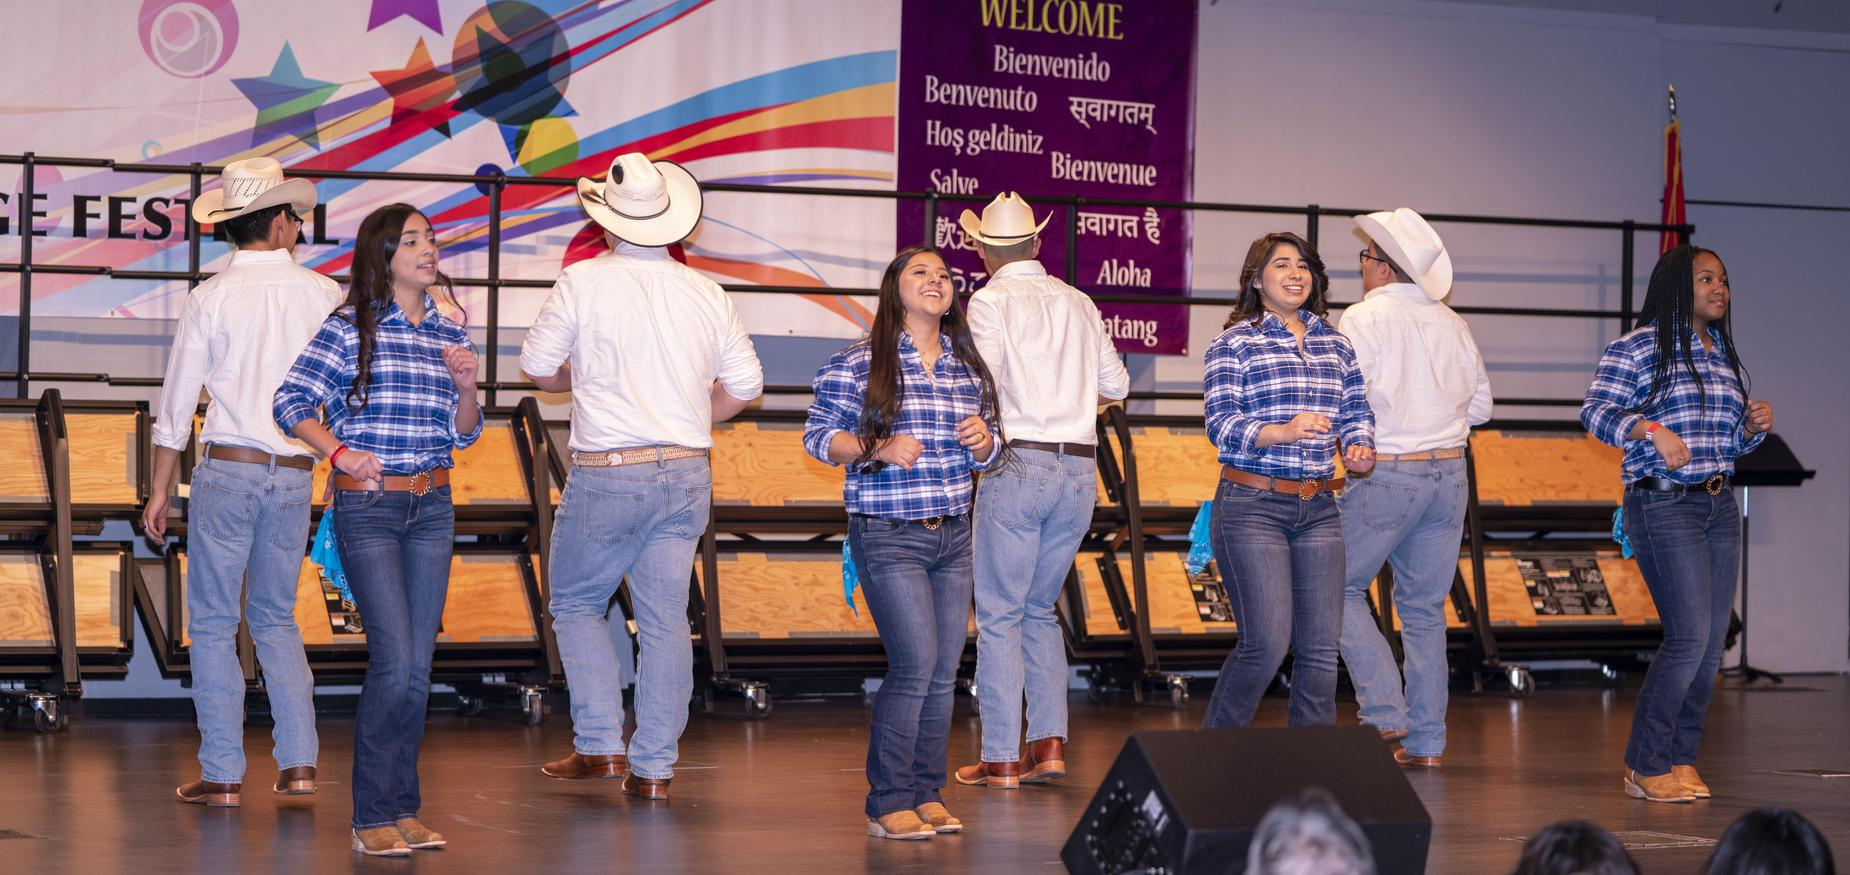 Photo of Hispanic folk dance by students